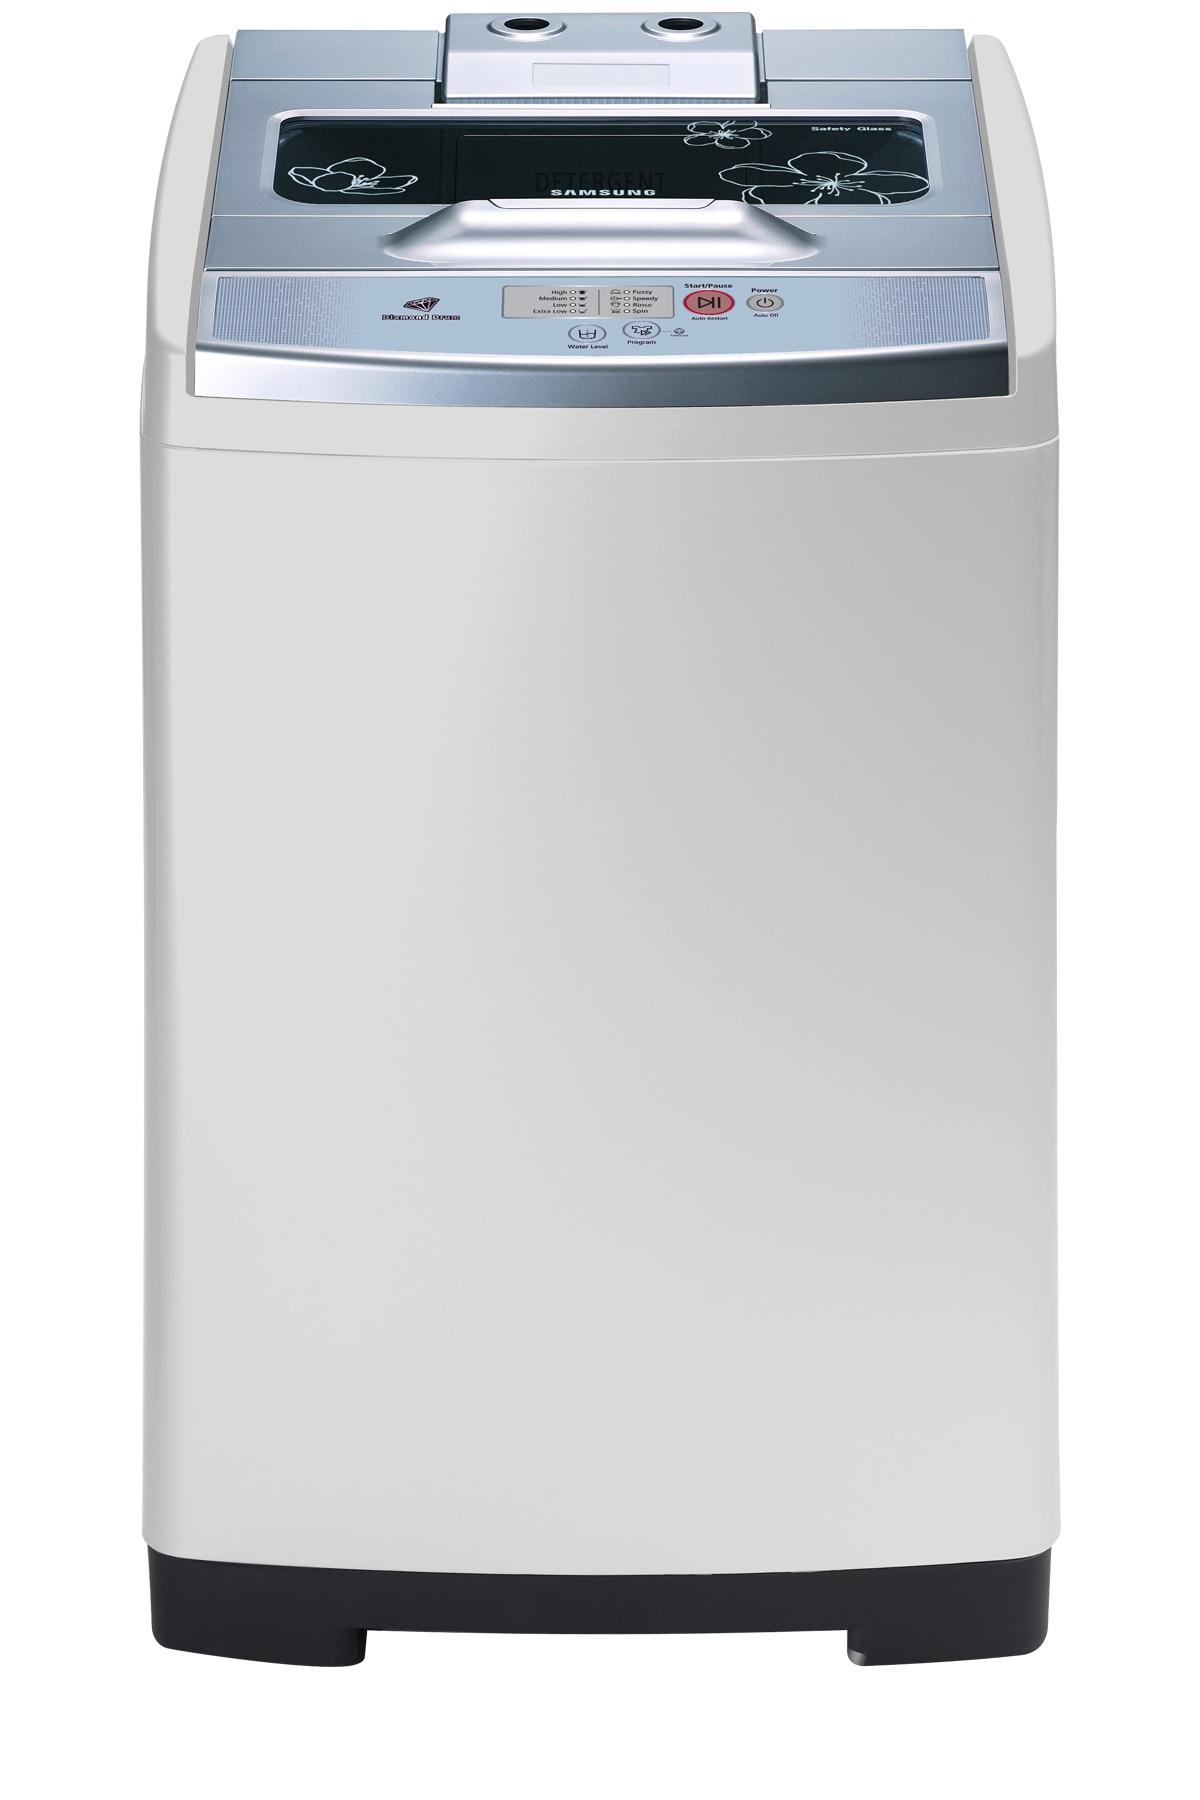 Samsung Top Load WA80E5LEC/TL - Price, Reviews & Specs